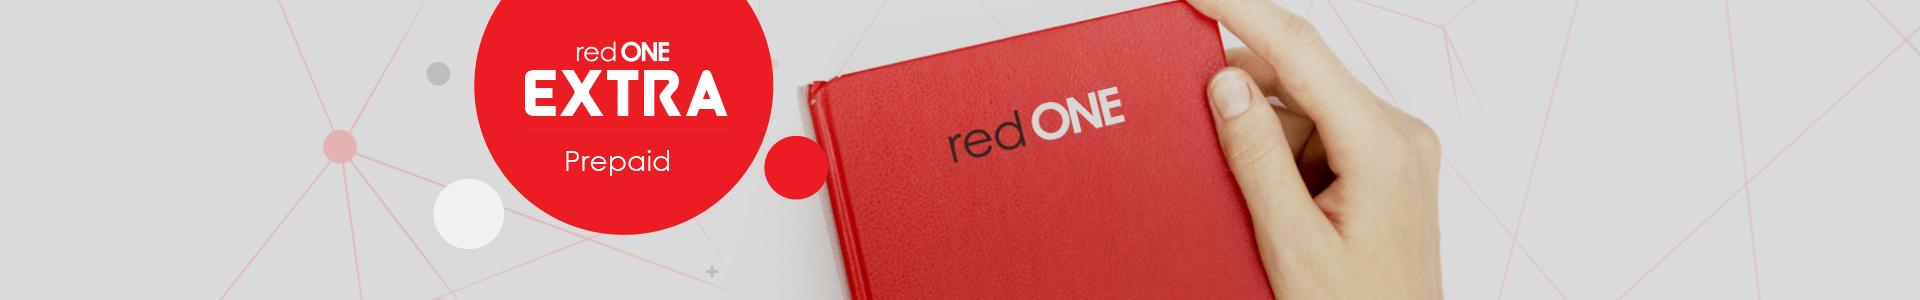 redONE Prepaid Extra